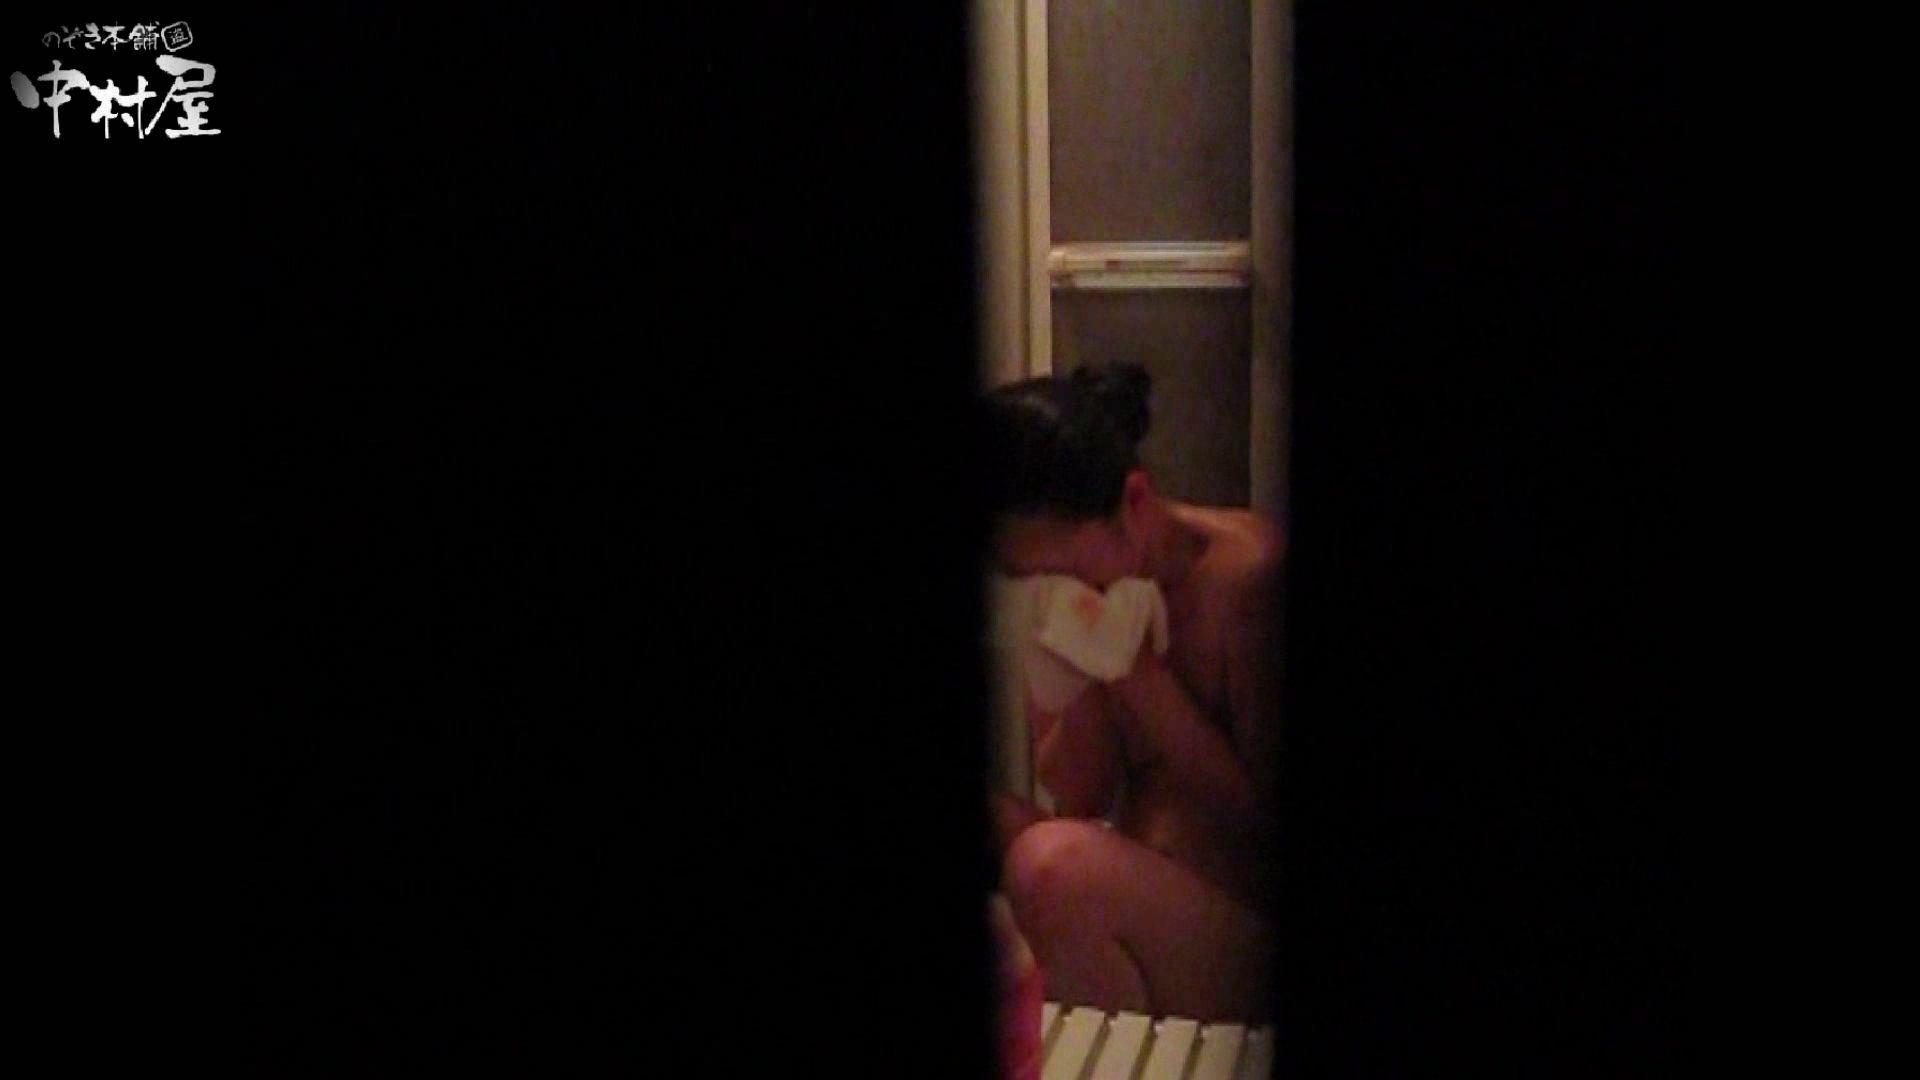 民家風呂専門盗撮師の超危険映像 vol.004 エロい美少女  89PIX 85